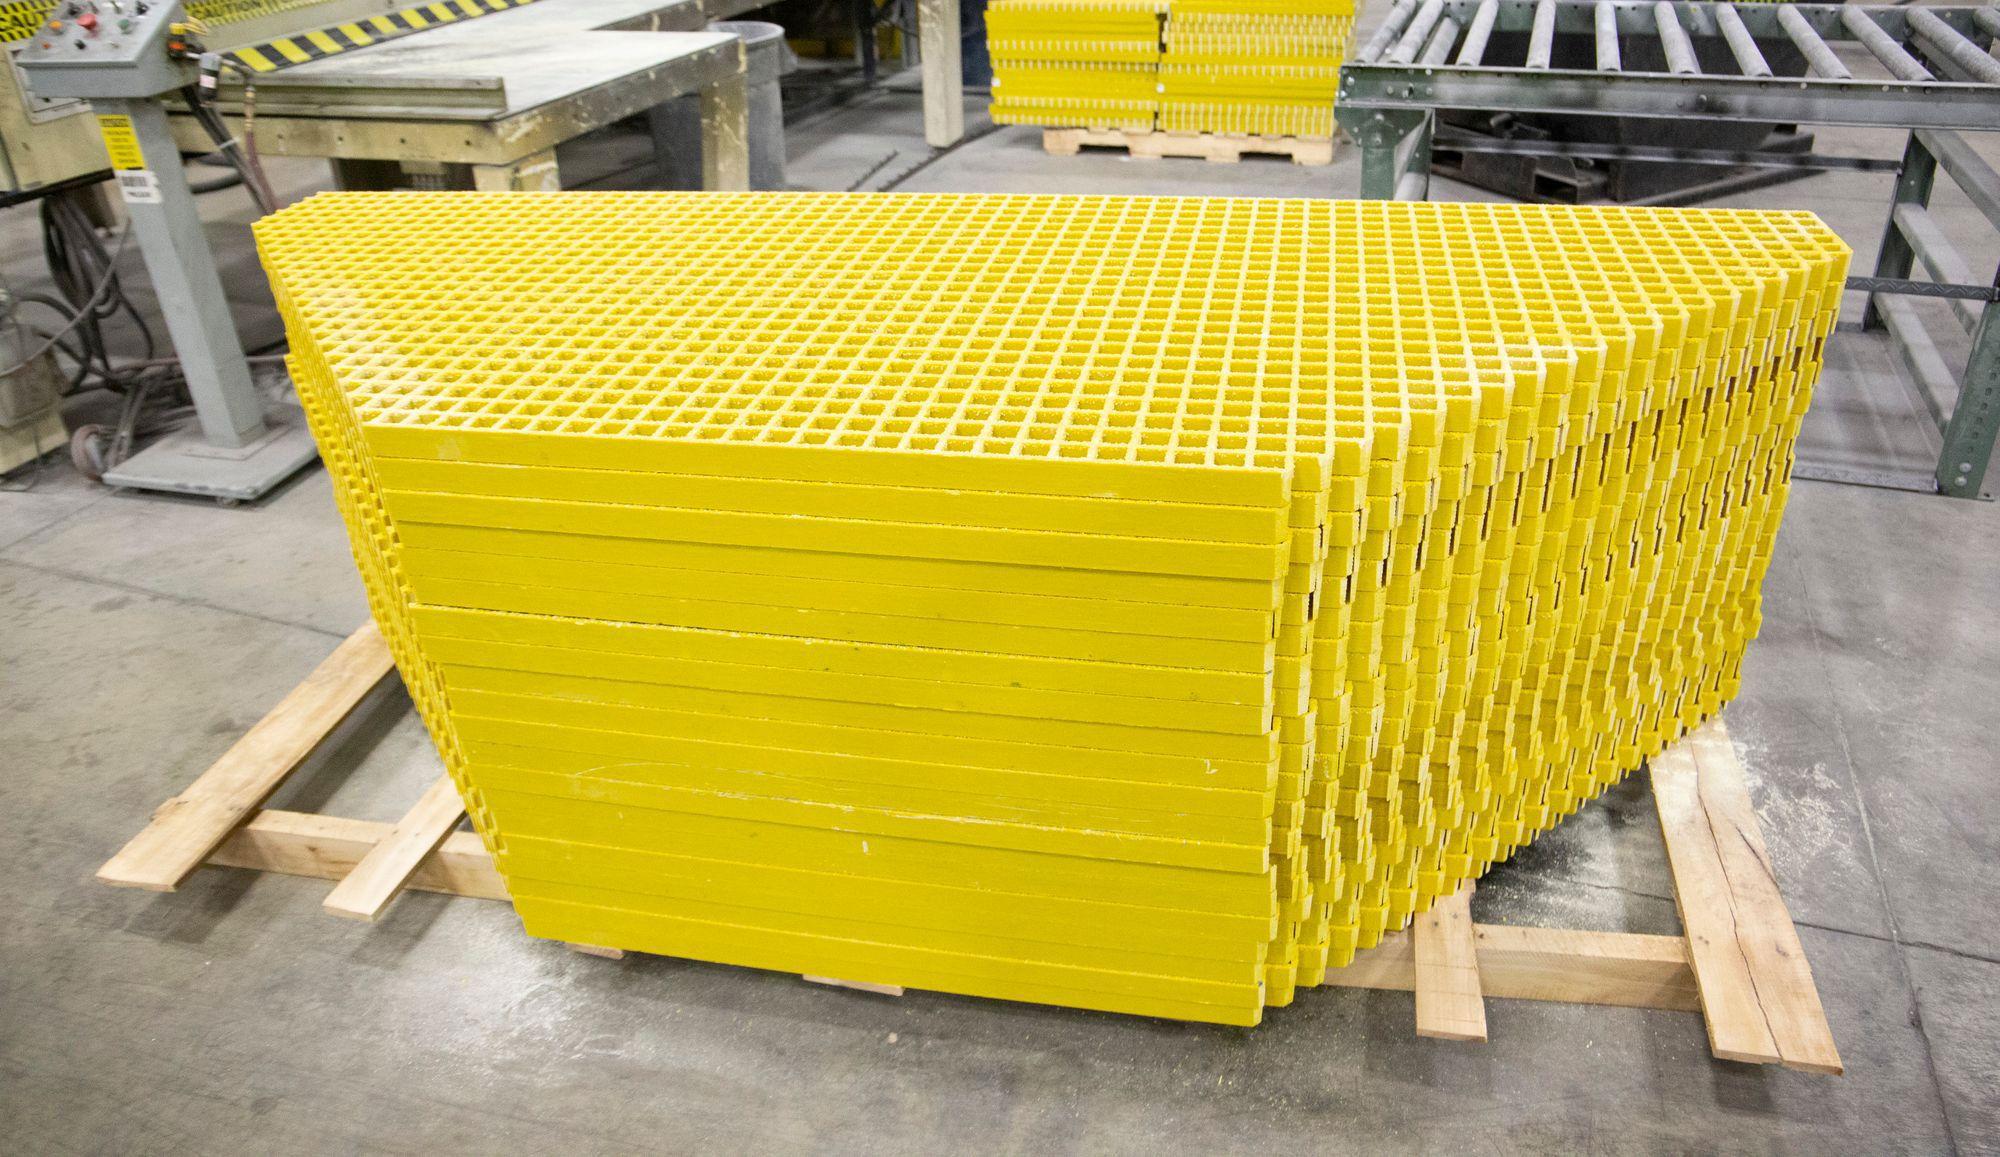 A stack of fiberglass grating